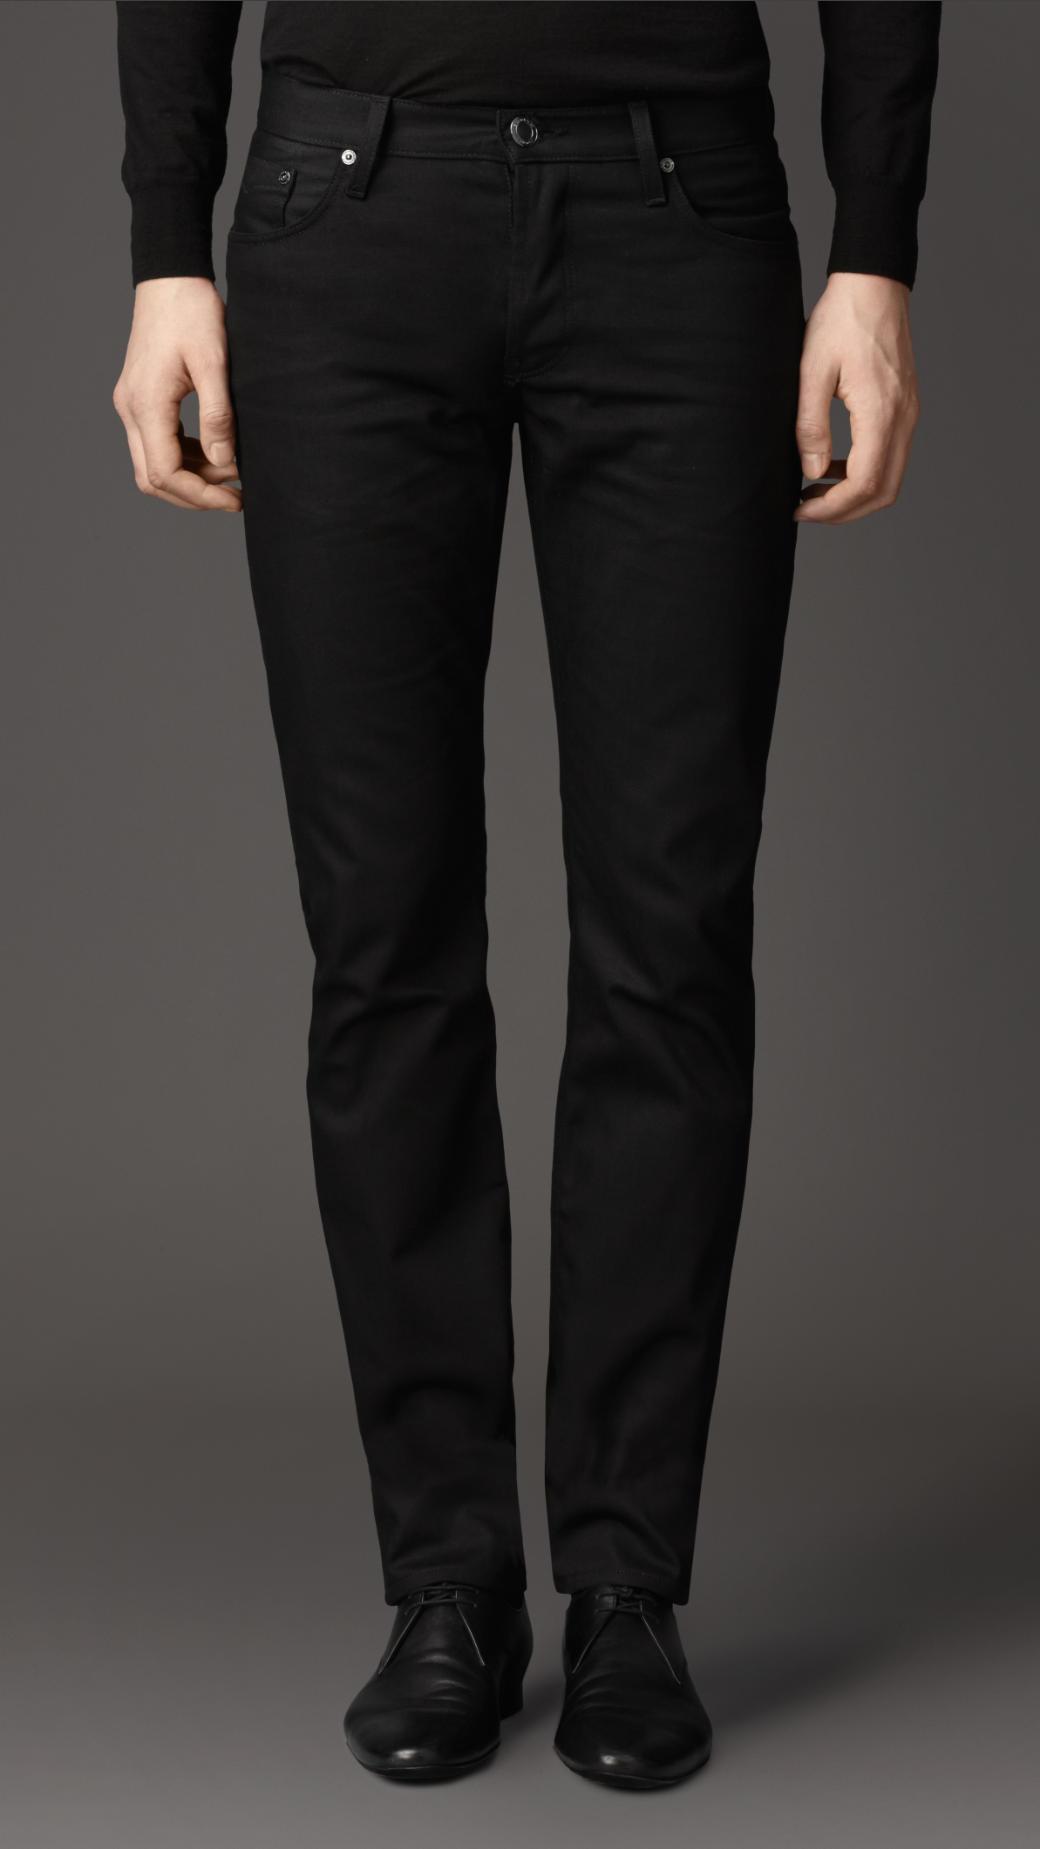 Burberry Steadman Black Slim Fit Jeans in Black for Men   Lyst